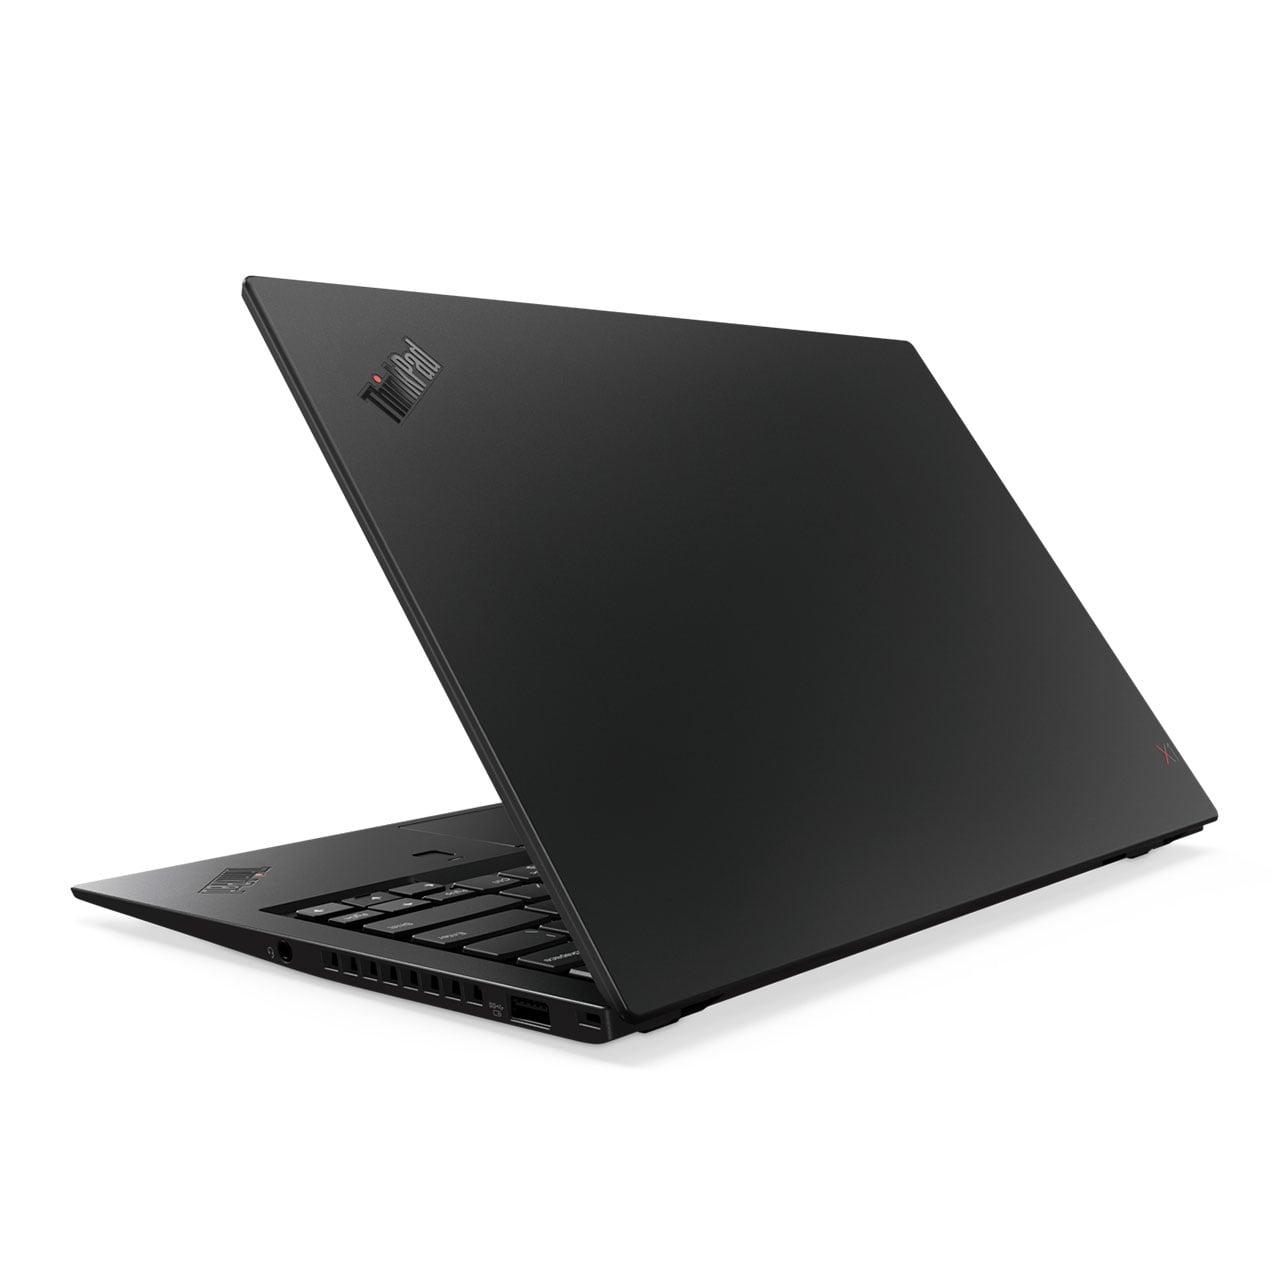 "Lenovo ThinkPad X1 Carbon 6th Generation, 14.0"", i7-8650U, 16 GB RAM, 512GB SSD, Win 10 Pro 64 1"